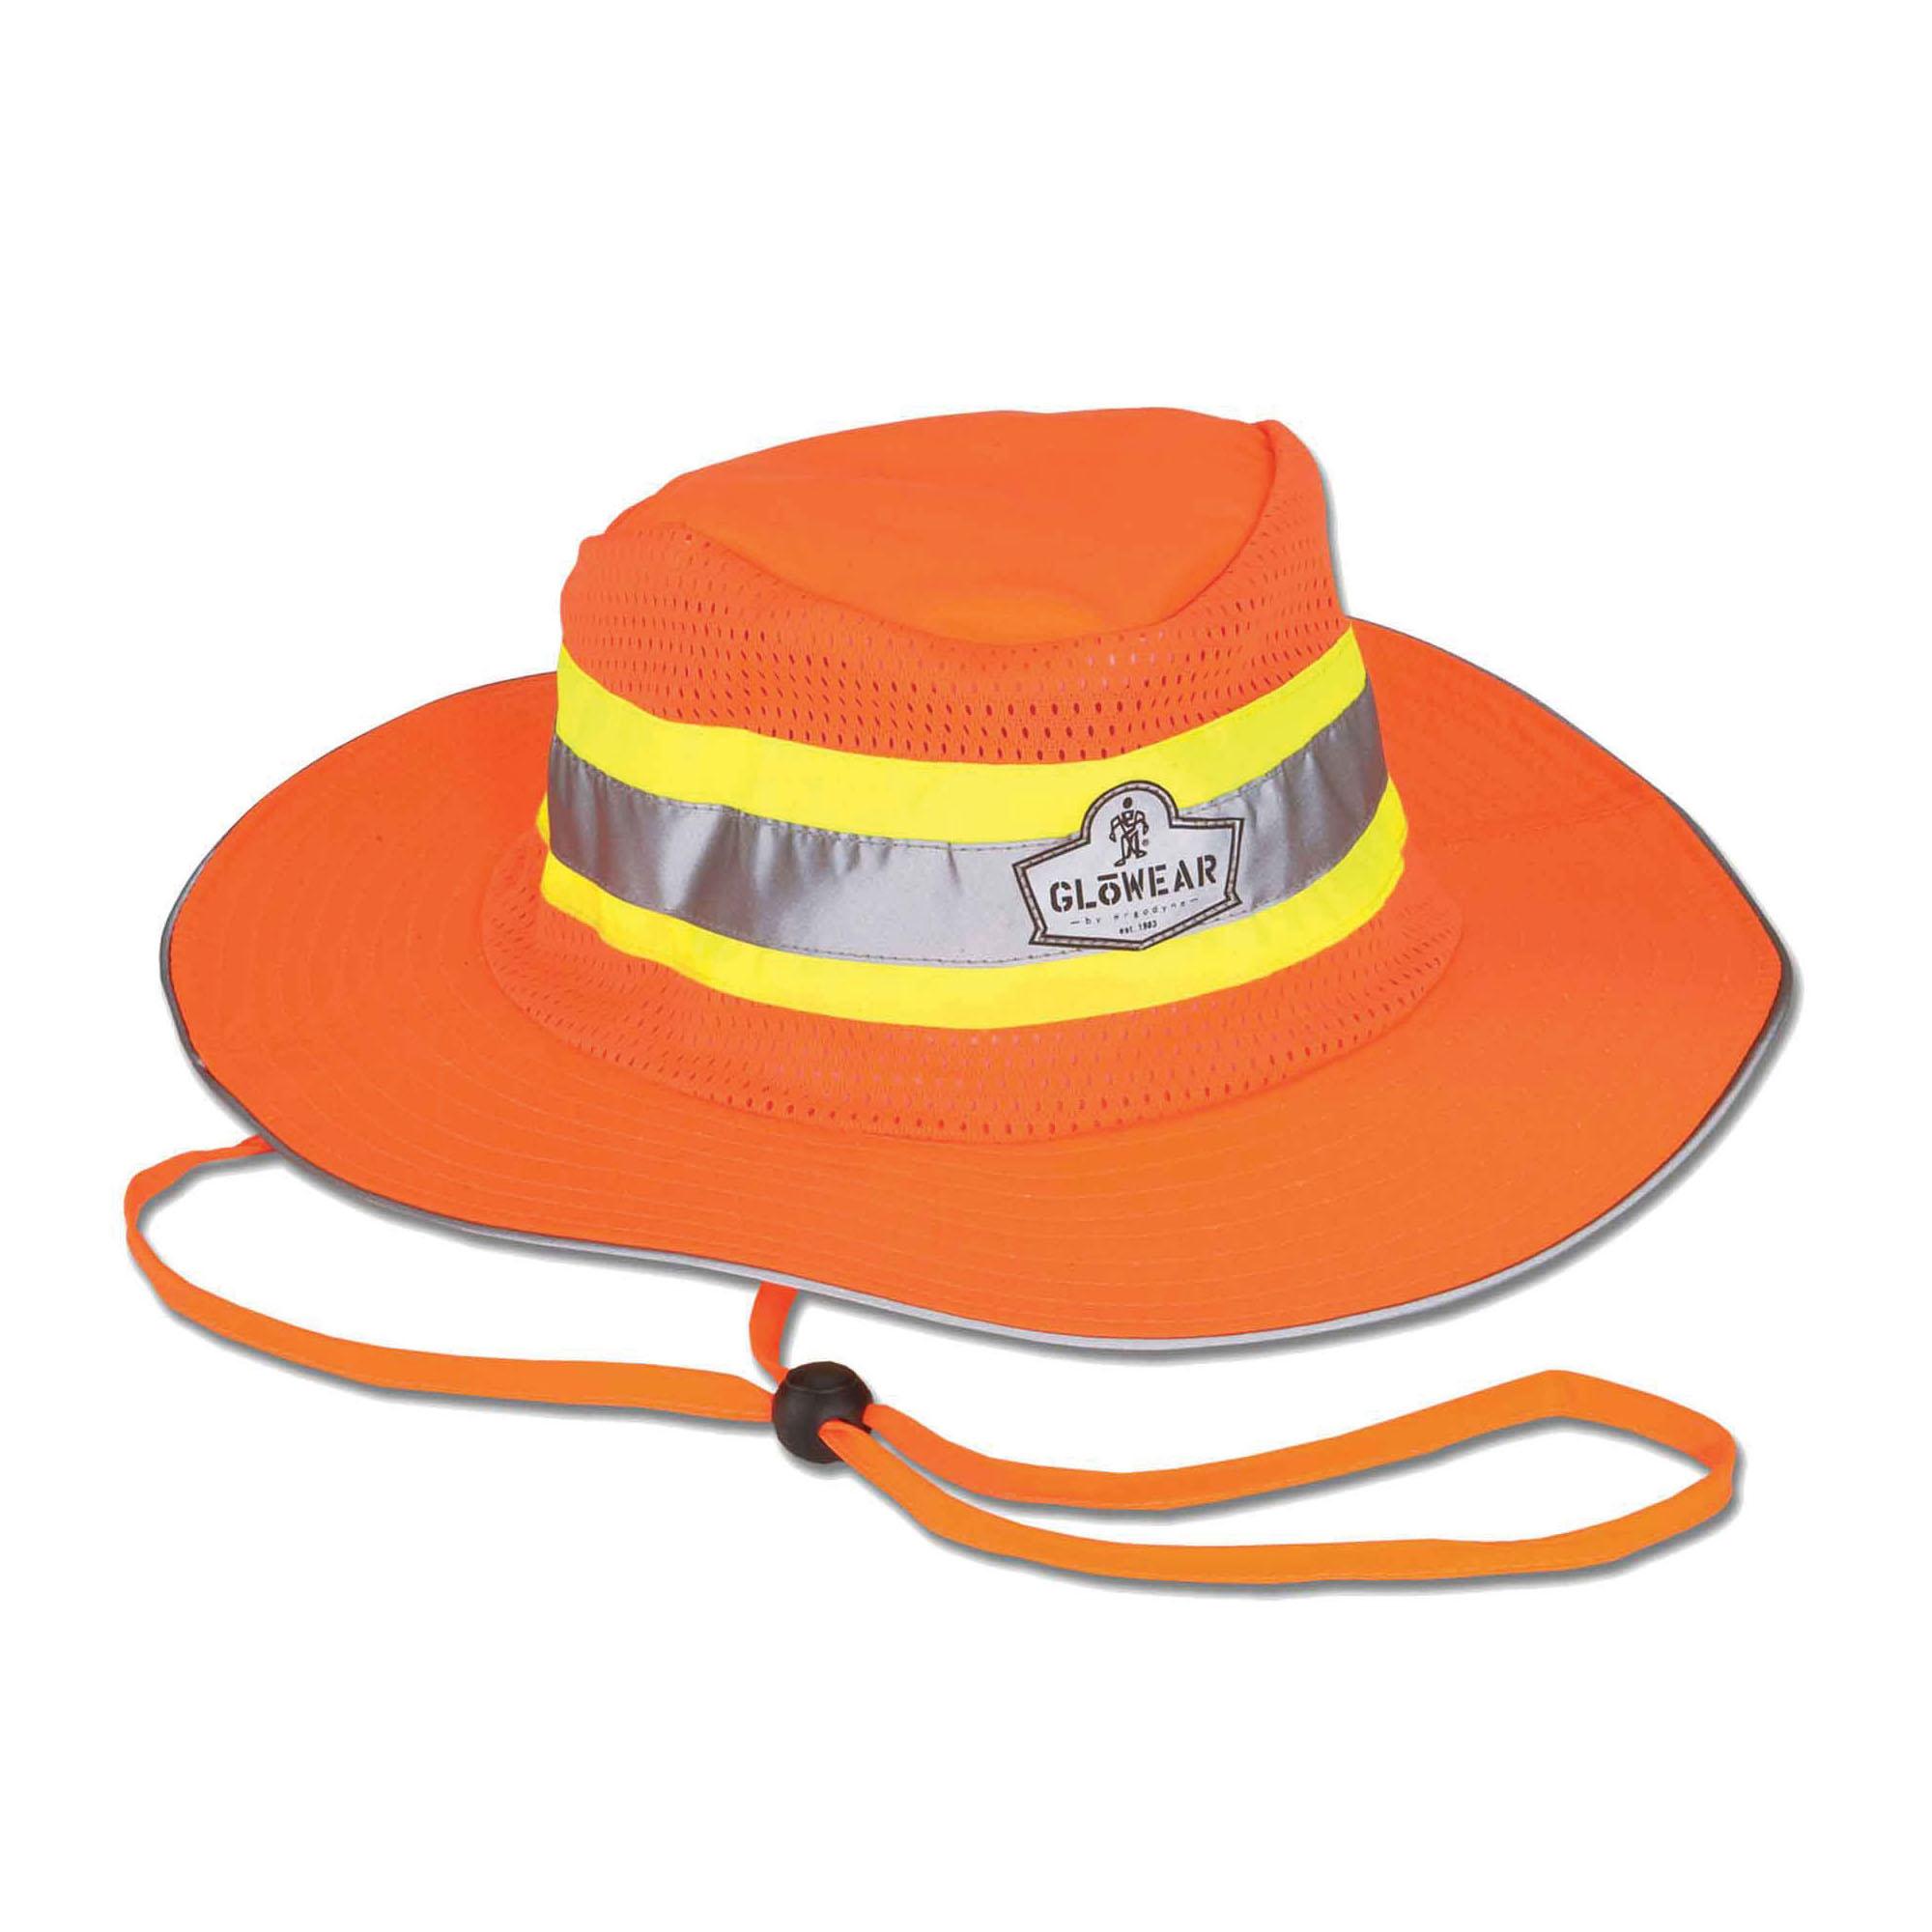 GloWear® 23257 8935 Ranger Hat, S to M, Hi-Viz Orange, 150D Oxford Polyester